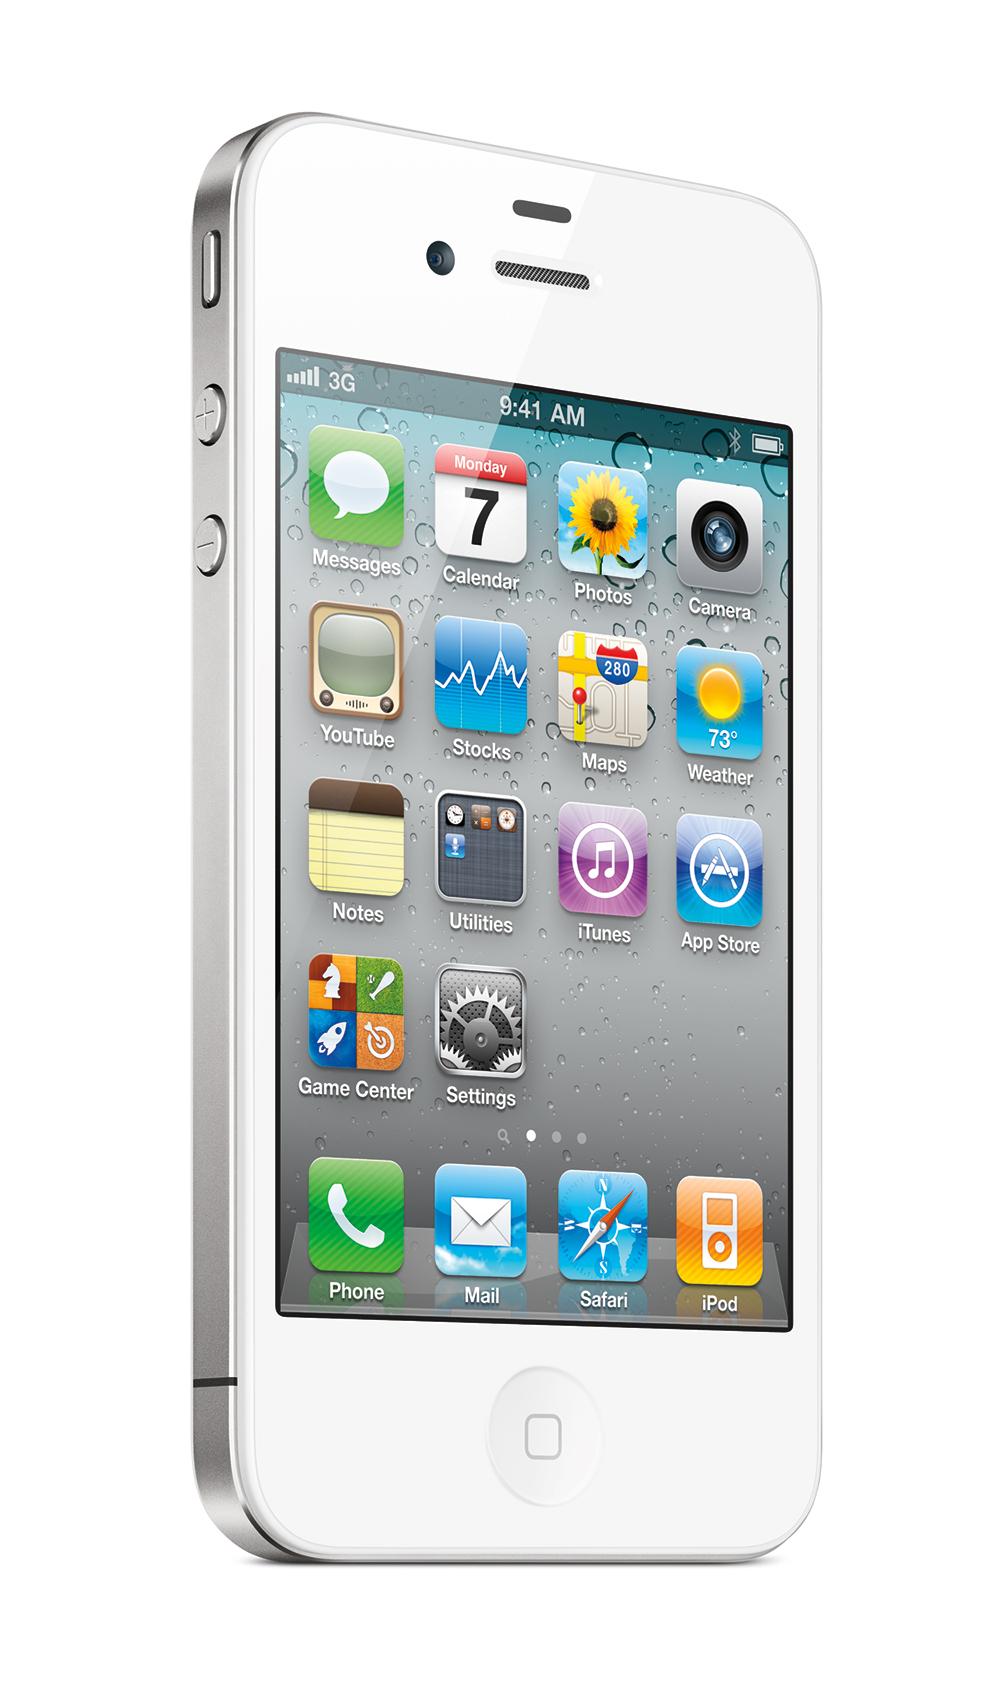 apple_white_iphone4_20110427